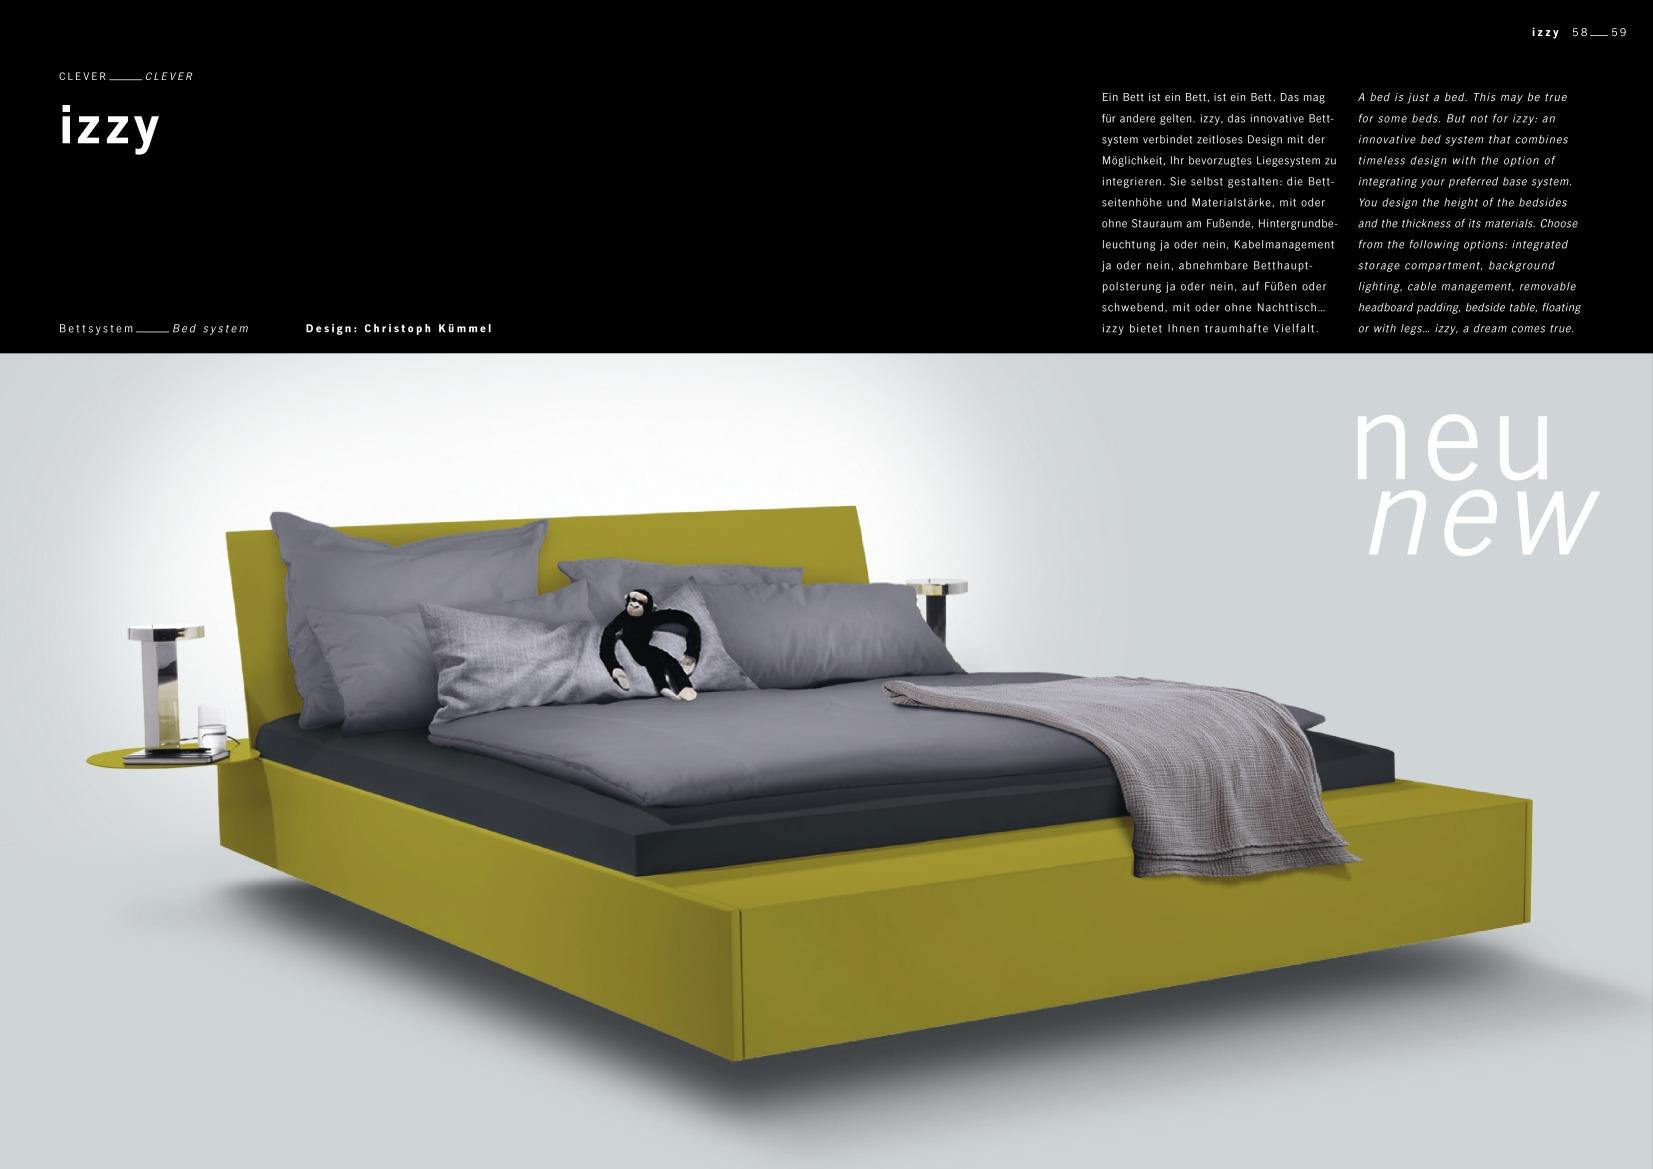 interluebke lookbook 2017 gs 28 m bel weber neustadt landau karlsruhe. Black Bedroom Furniture Sets. Home Design Ideas